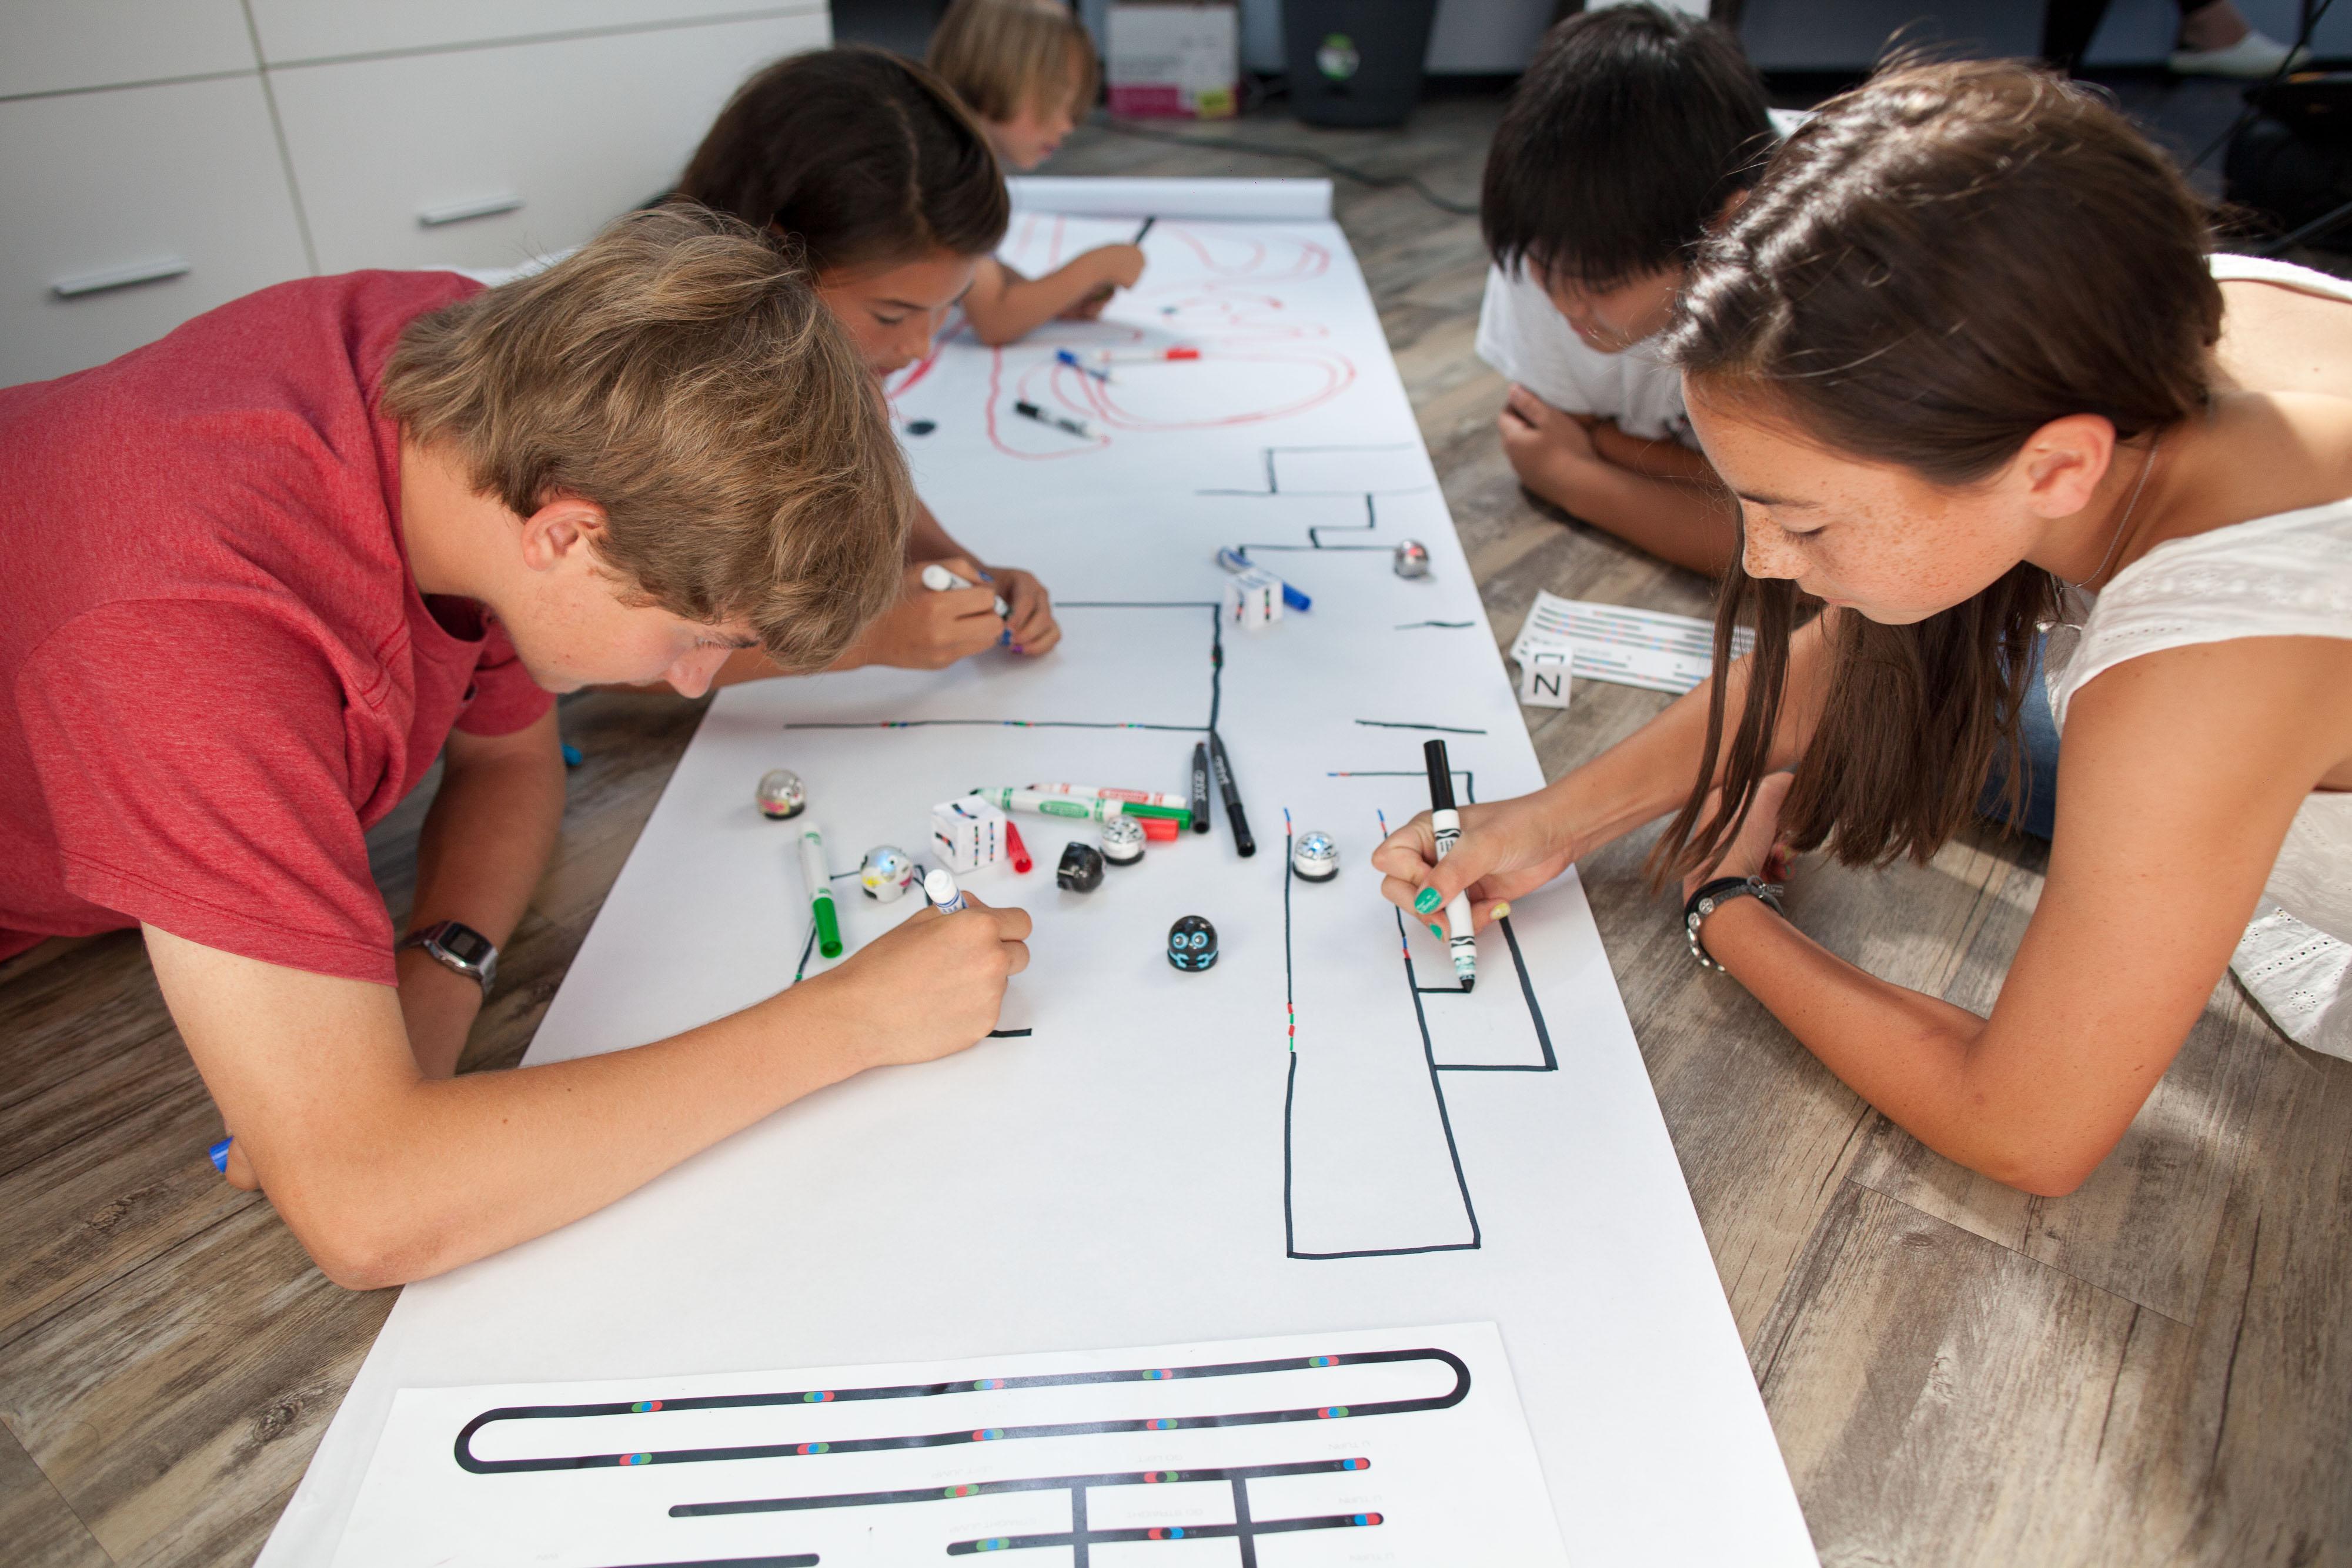 free summer classes for adults cincinnati